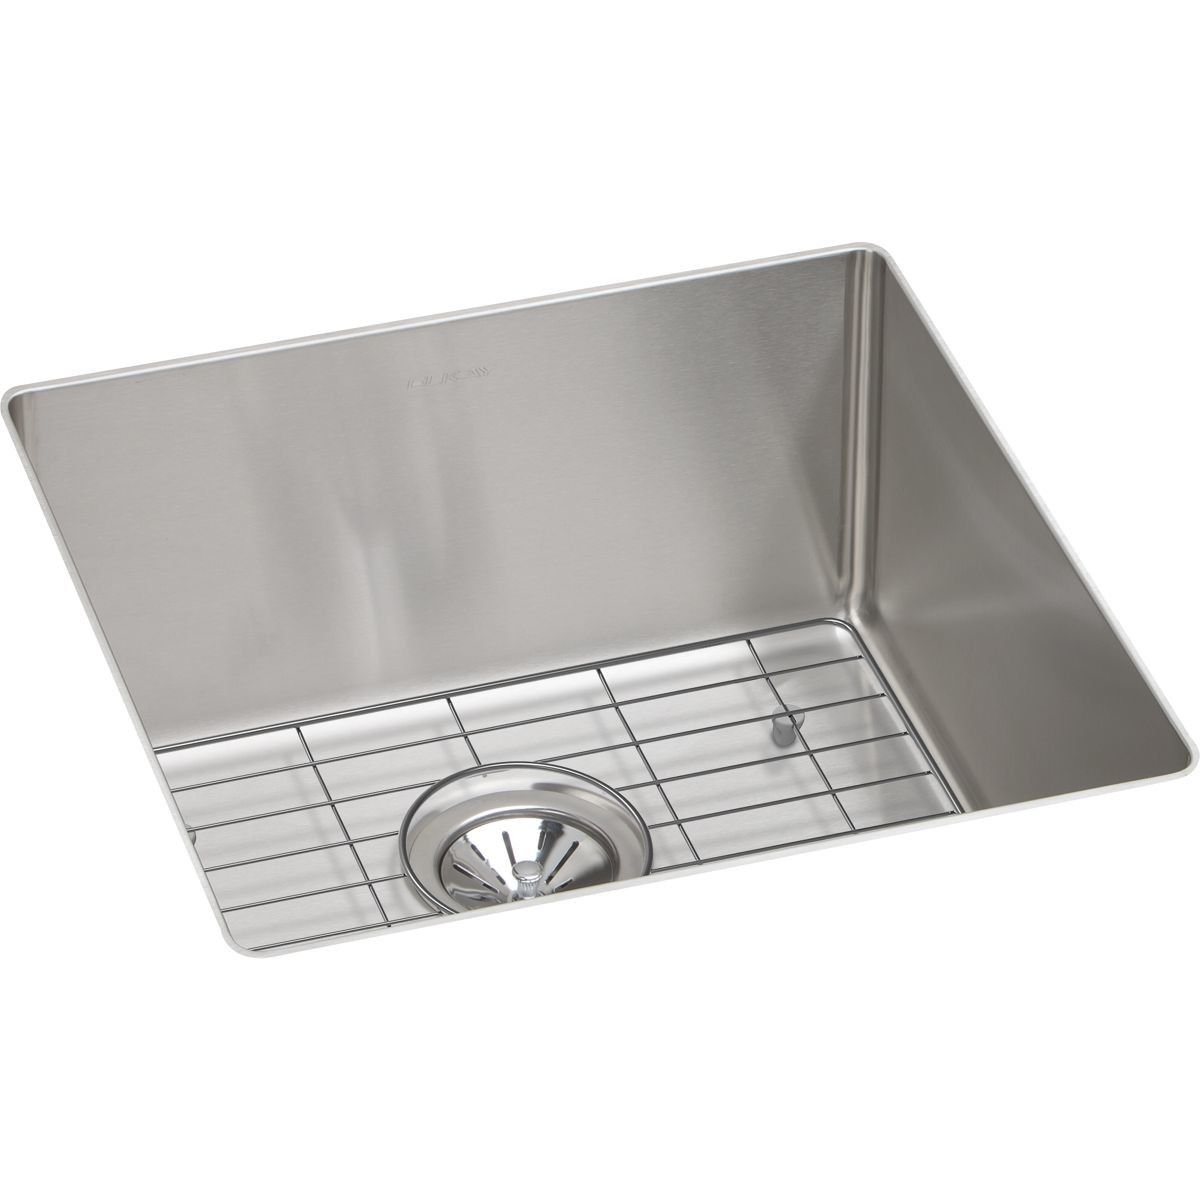 Elkay Crosstown Single Bowl Undermount Kitchen Sink Kit